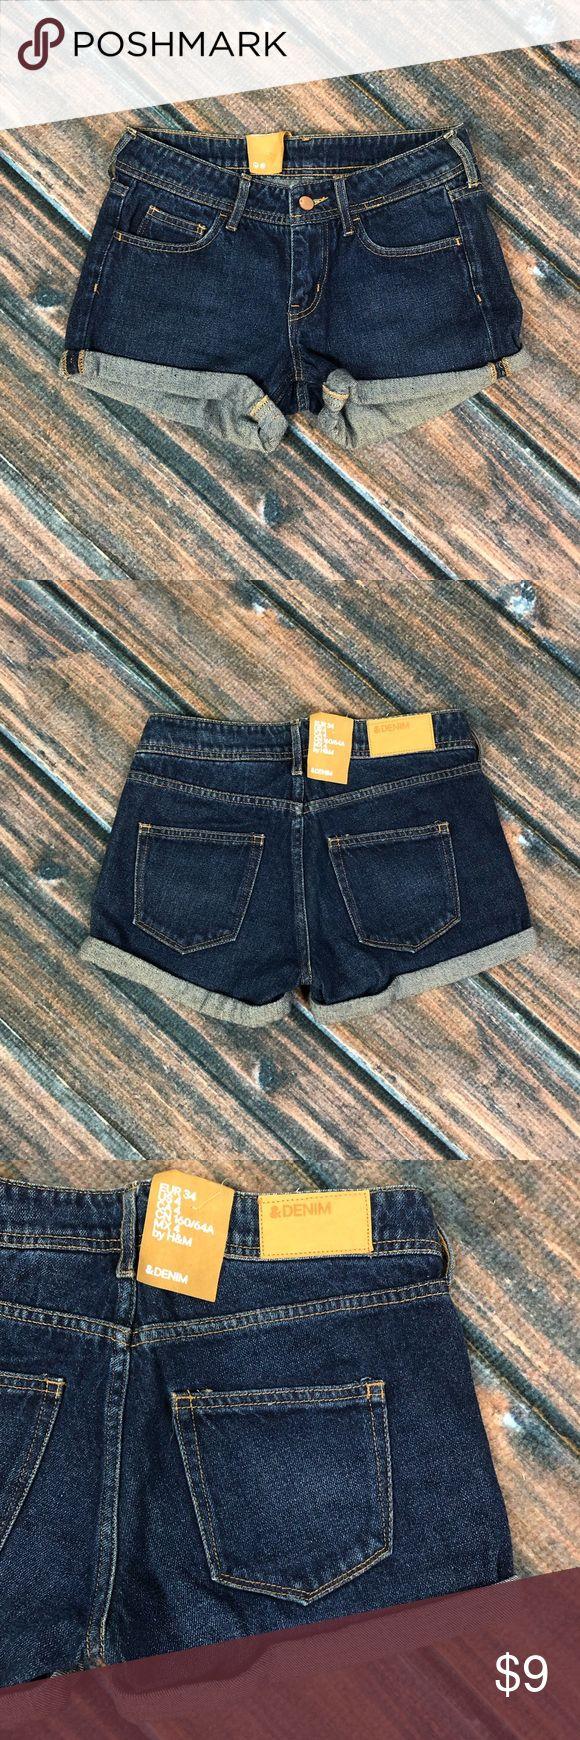 NWT H & M Shorts 🌟 Hervorragender Zustand 🌟 NWT H & M Shorts Dunkle Waschung …   – My Posh Picks